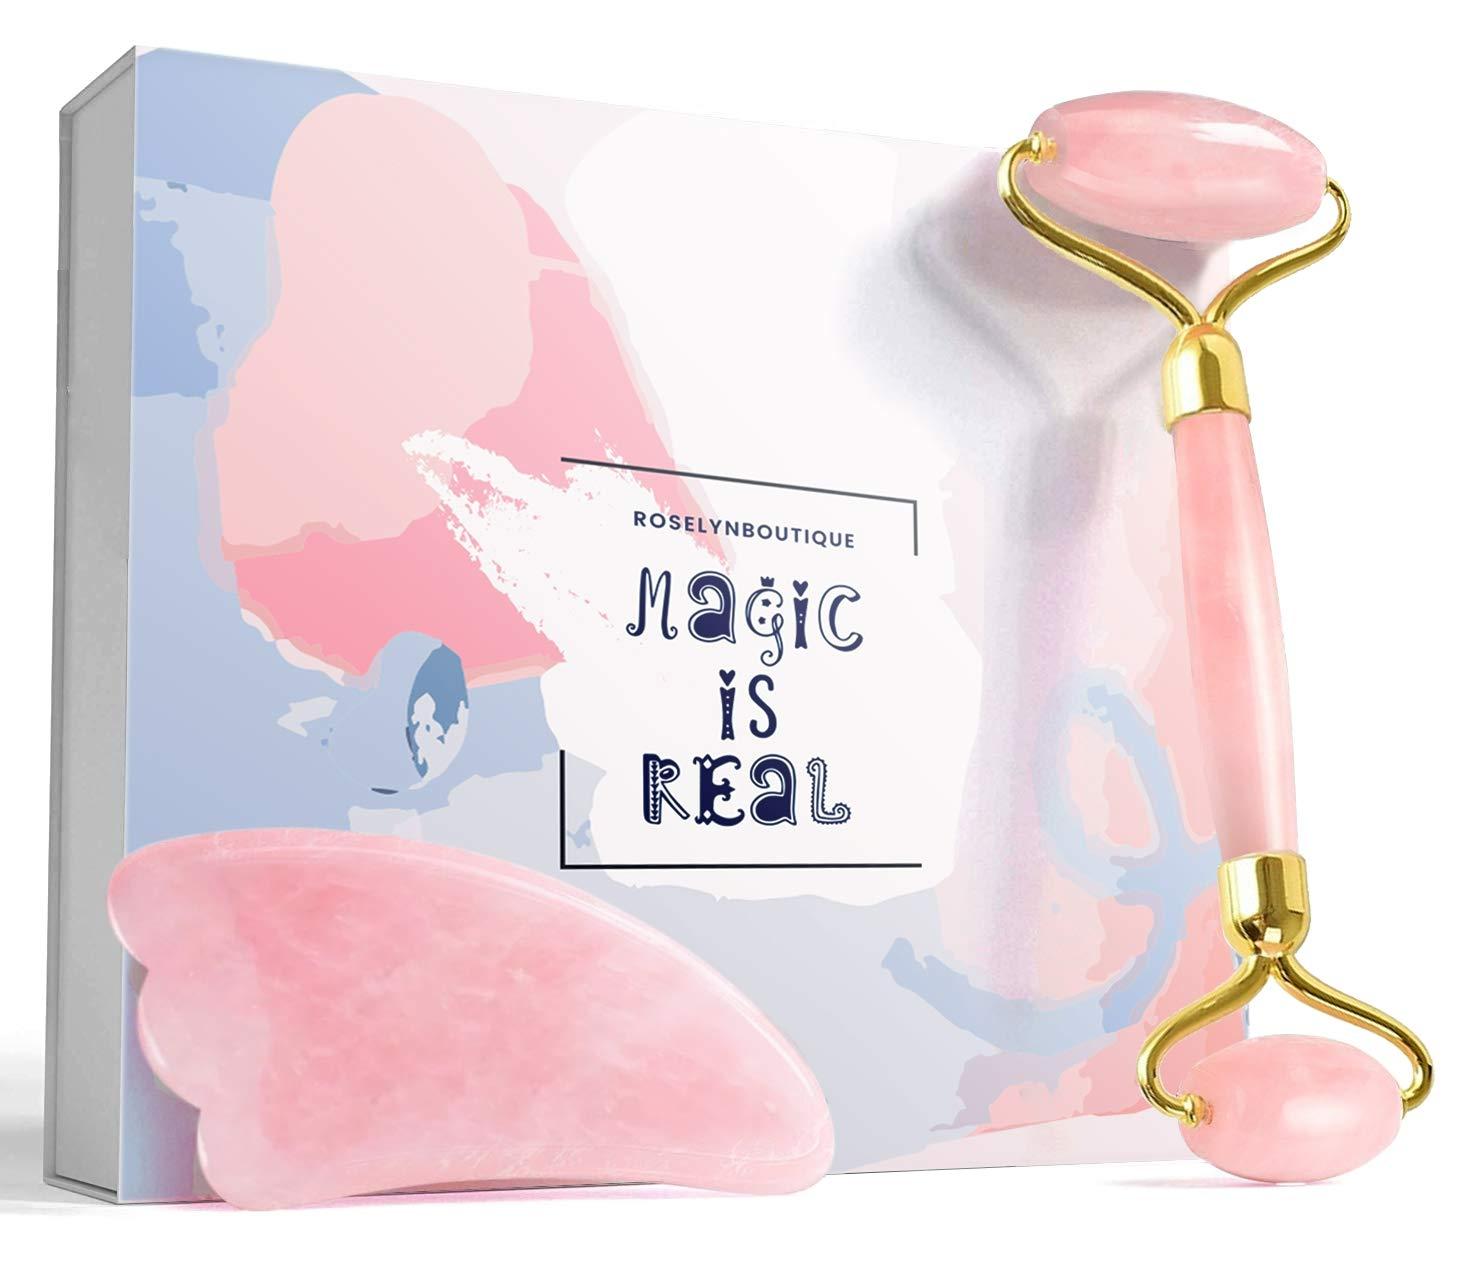 Jade Roller Gua Sha Set for Beautiful Skin Detox - Beauty Skin Massager Tool - Original Natural Jade Stone (Quartz)